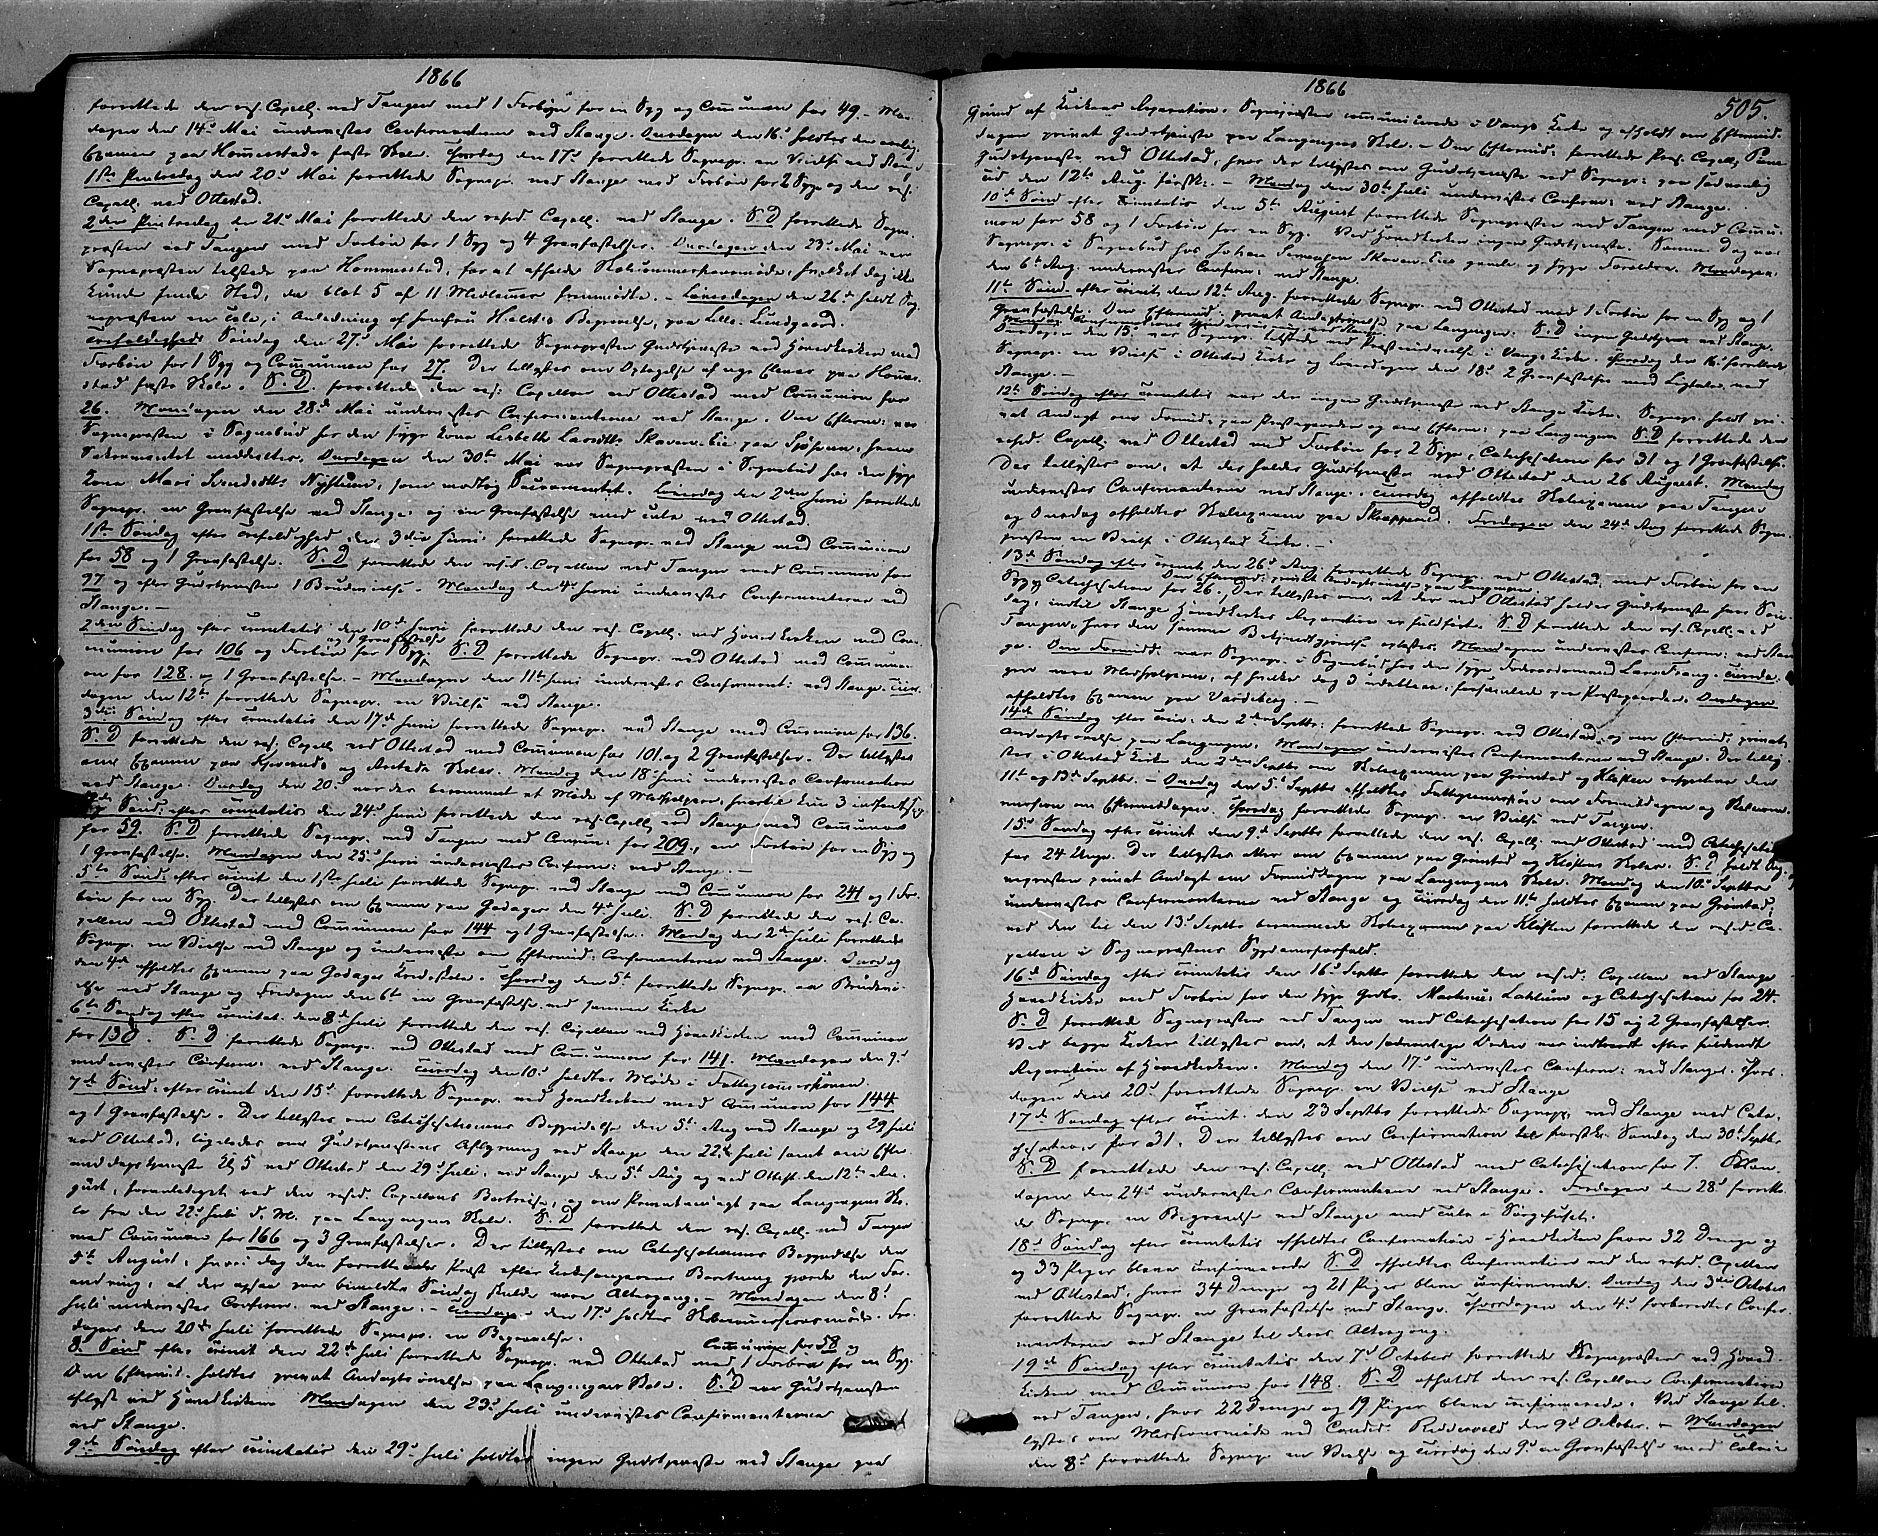 SAH, Stange prestekontor, K/L0013: Ministerialbok nr. 13, 1862-1879, s. 505